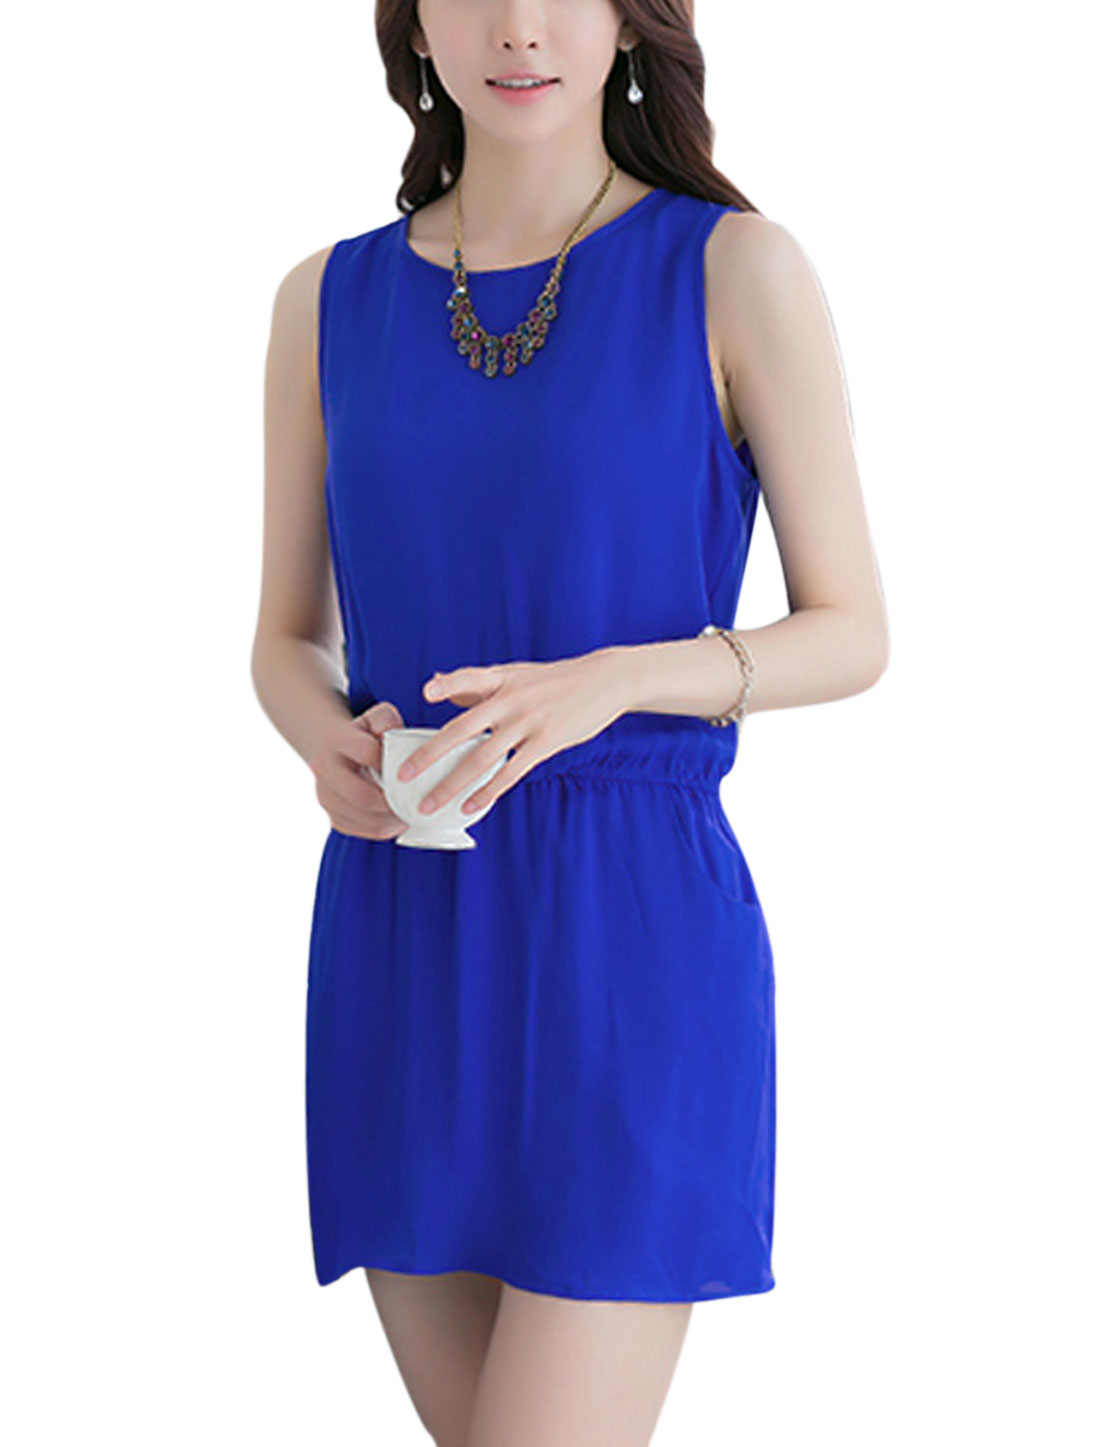 Lady Sleeveless Elastic Waist Unlined Semi Sheer Chiffon Dress Royal Blue S